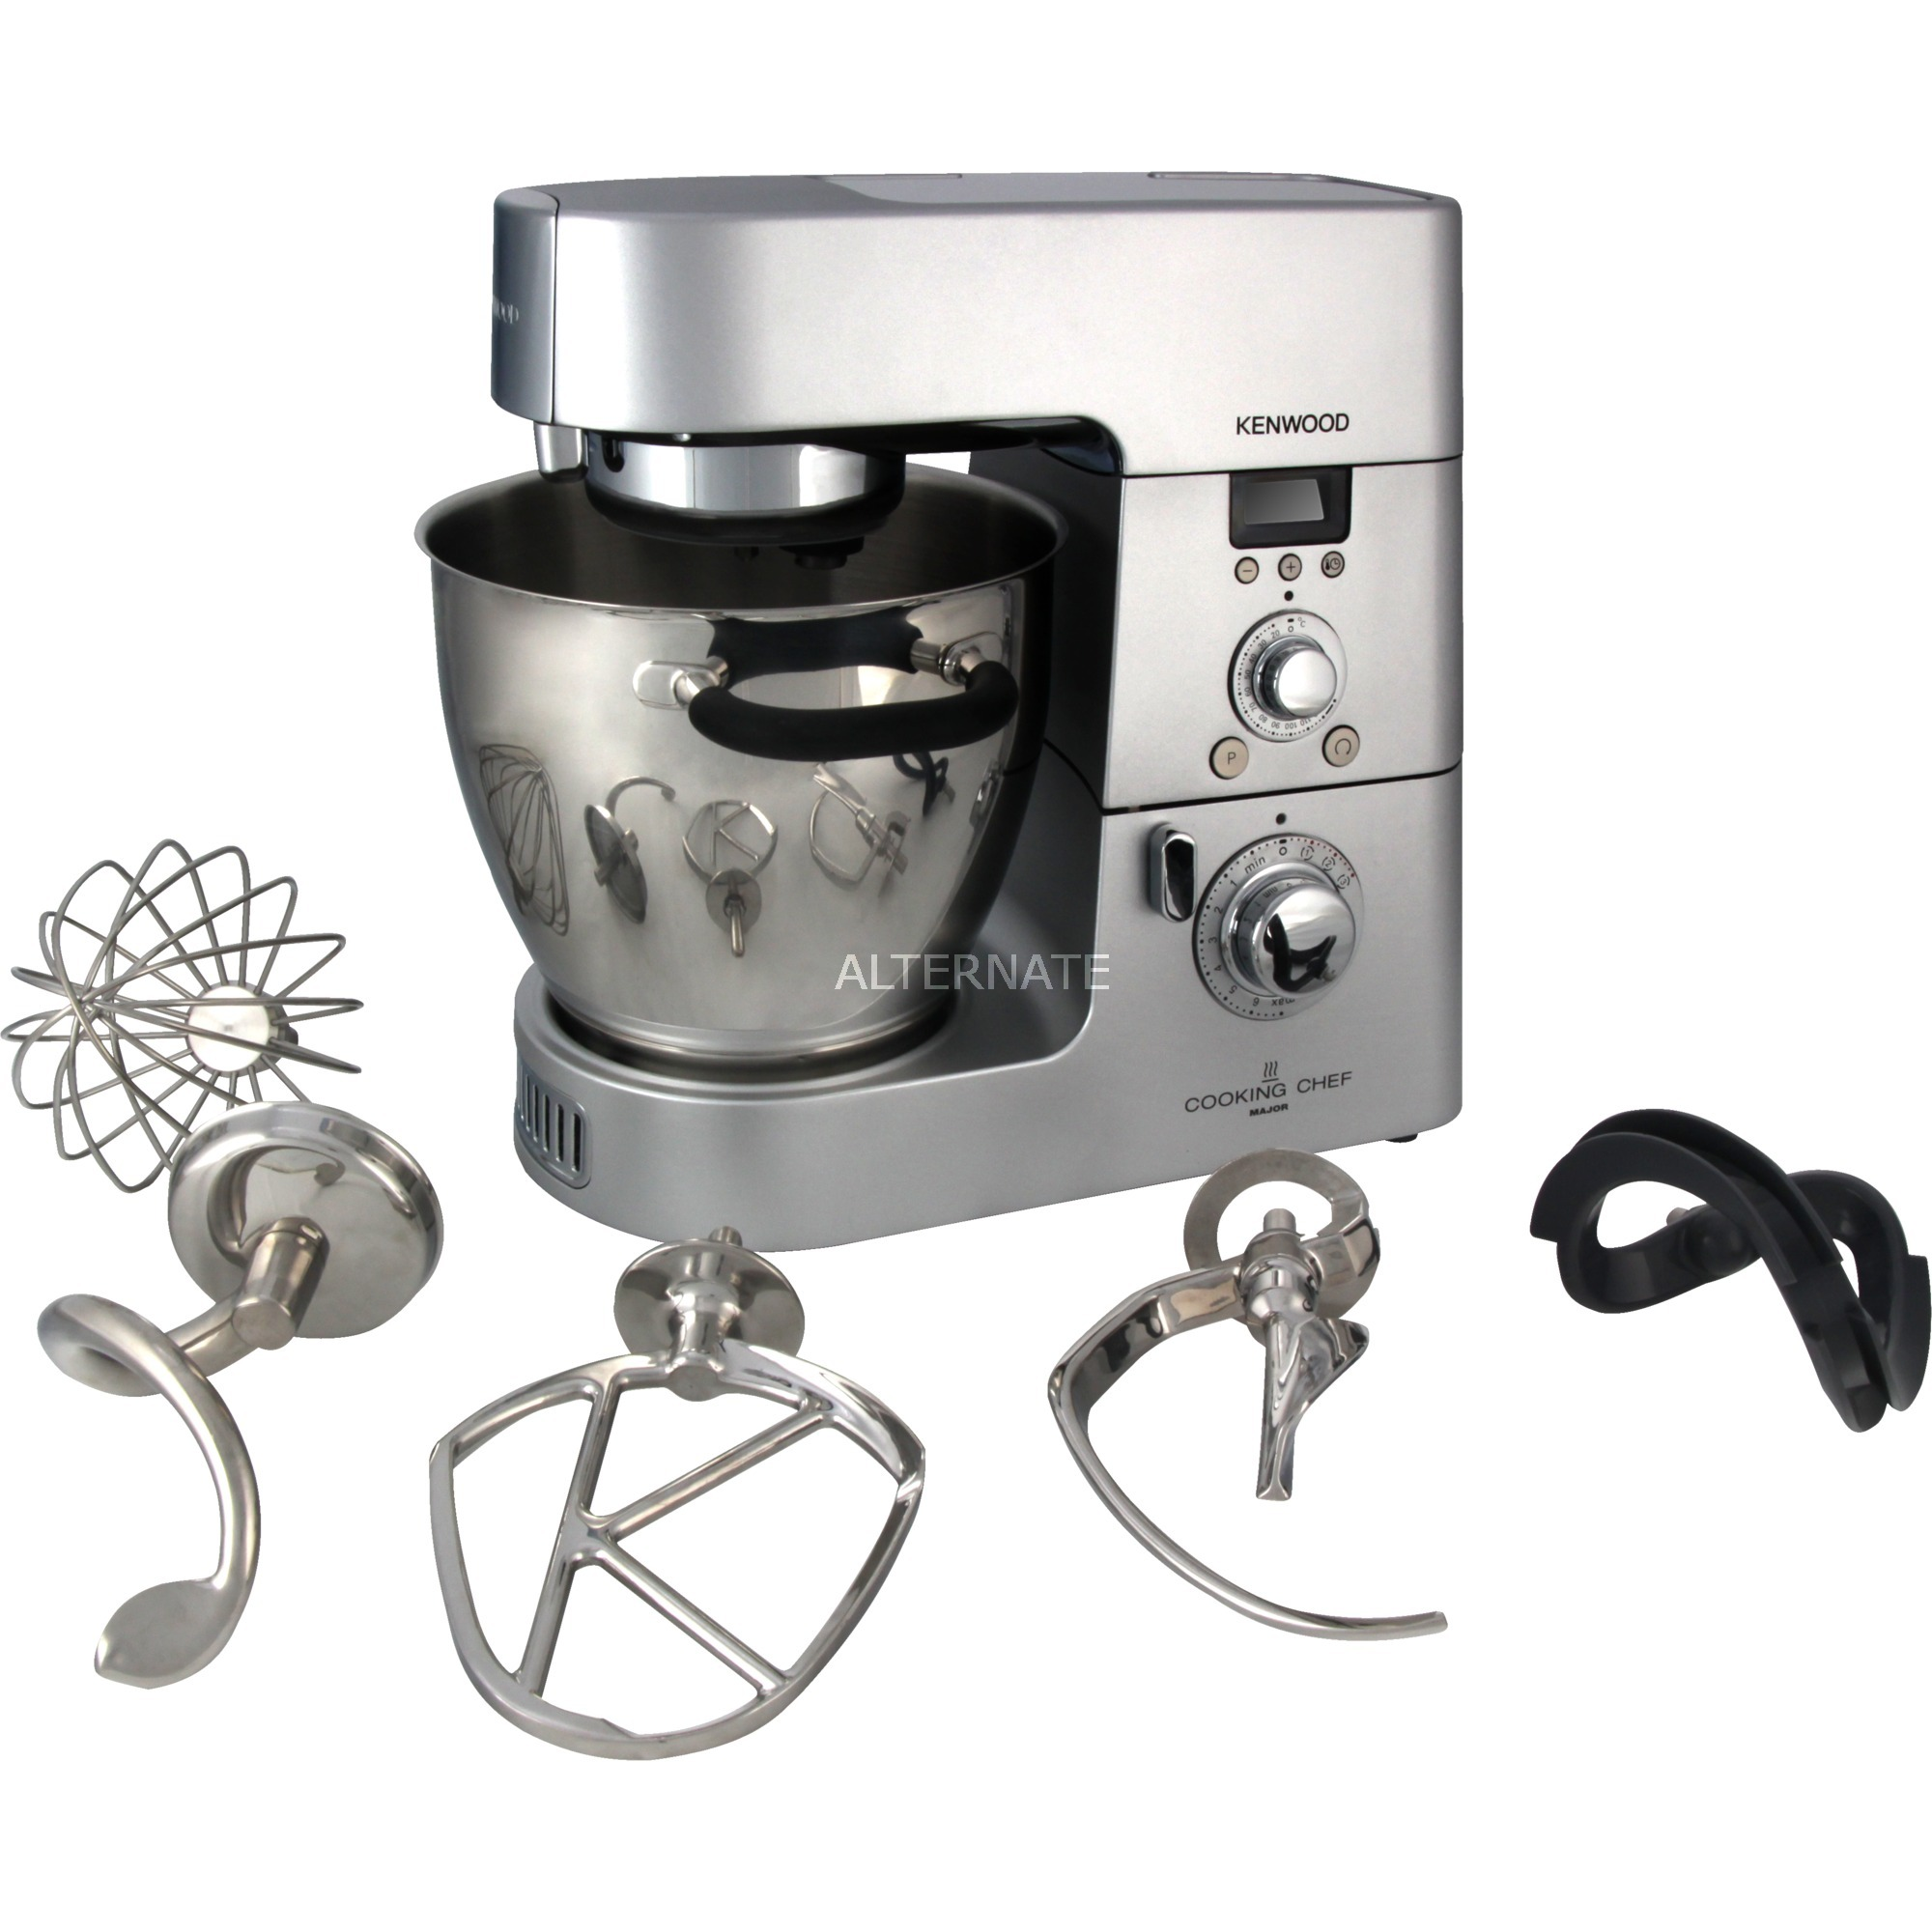 Ariston robot cucina funzione impastatrice prezzi migliori offerte - Robot da cucina kenwood cooking chef ...